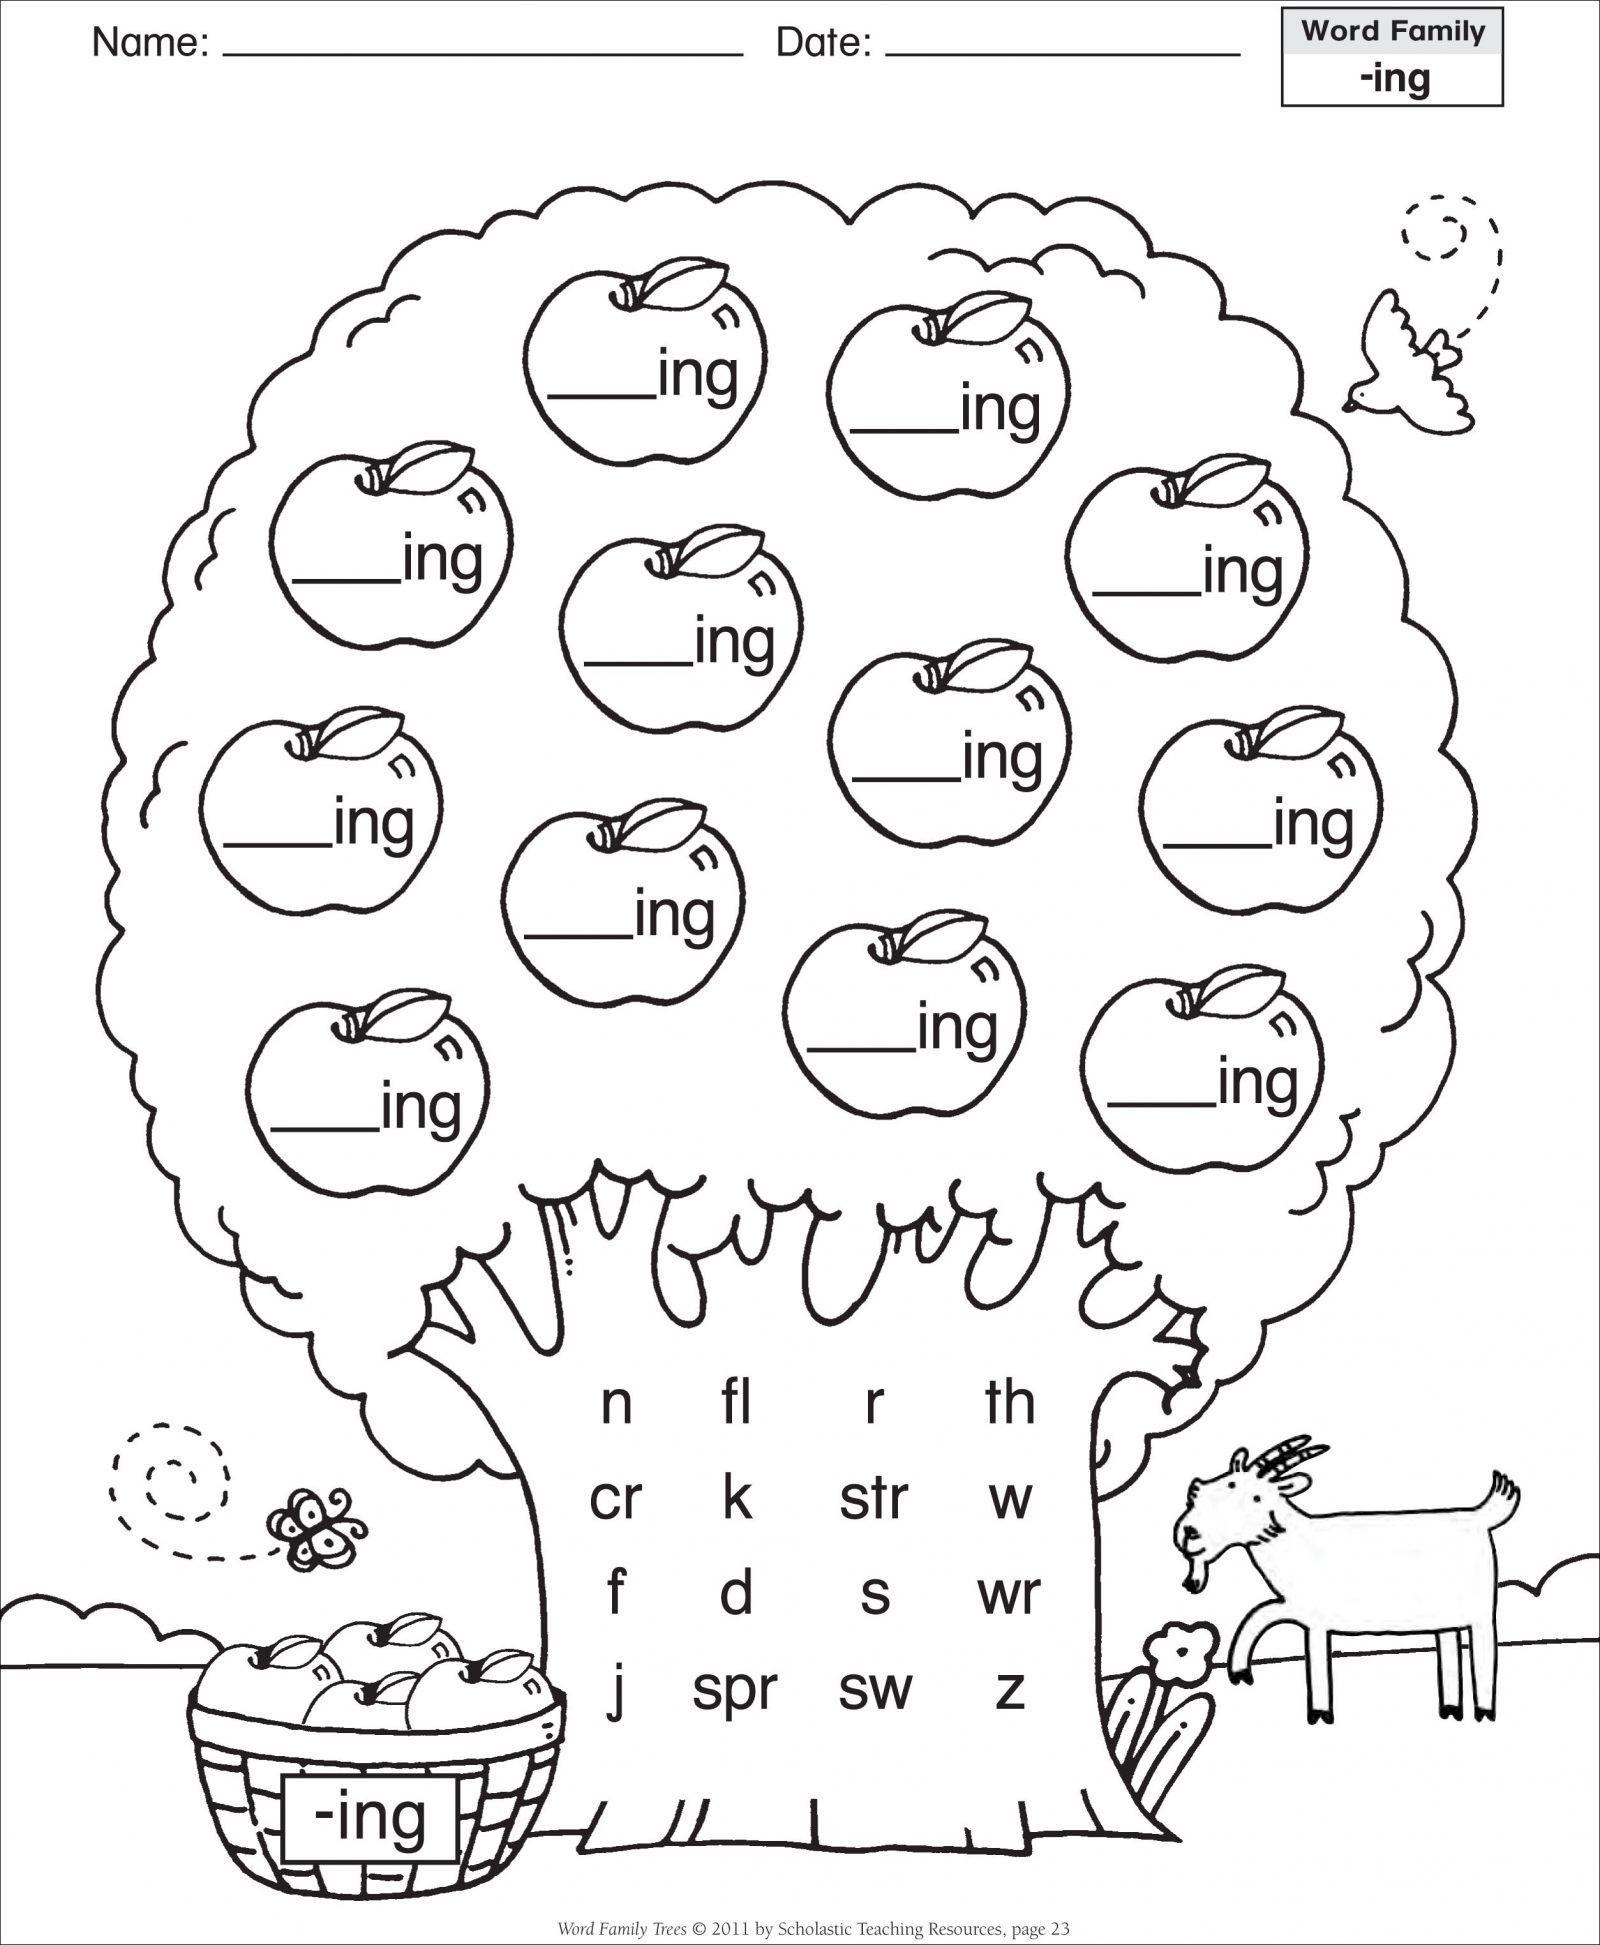 Word Families Worksheets For Preschoolers Save